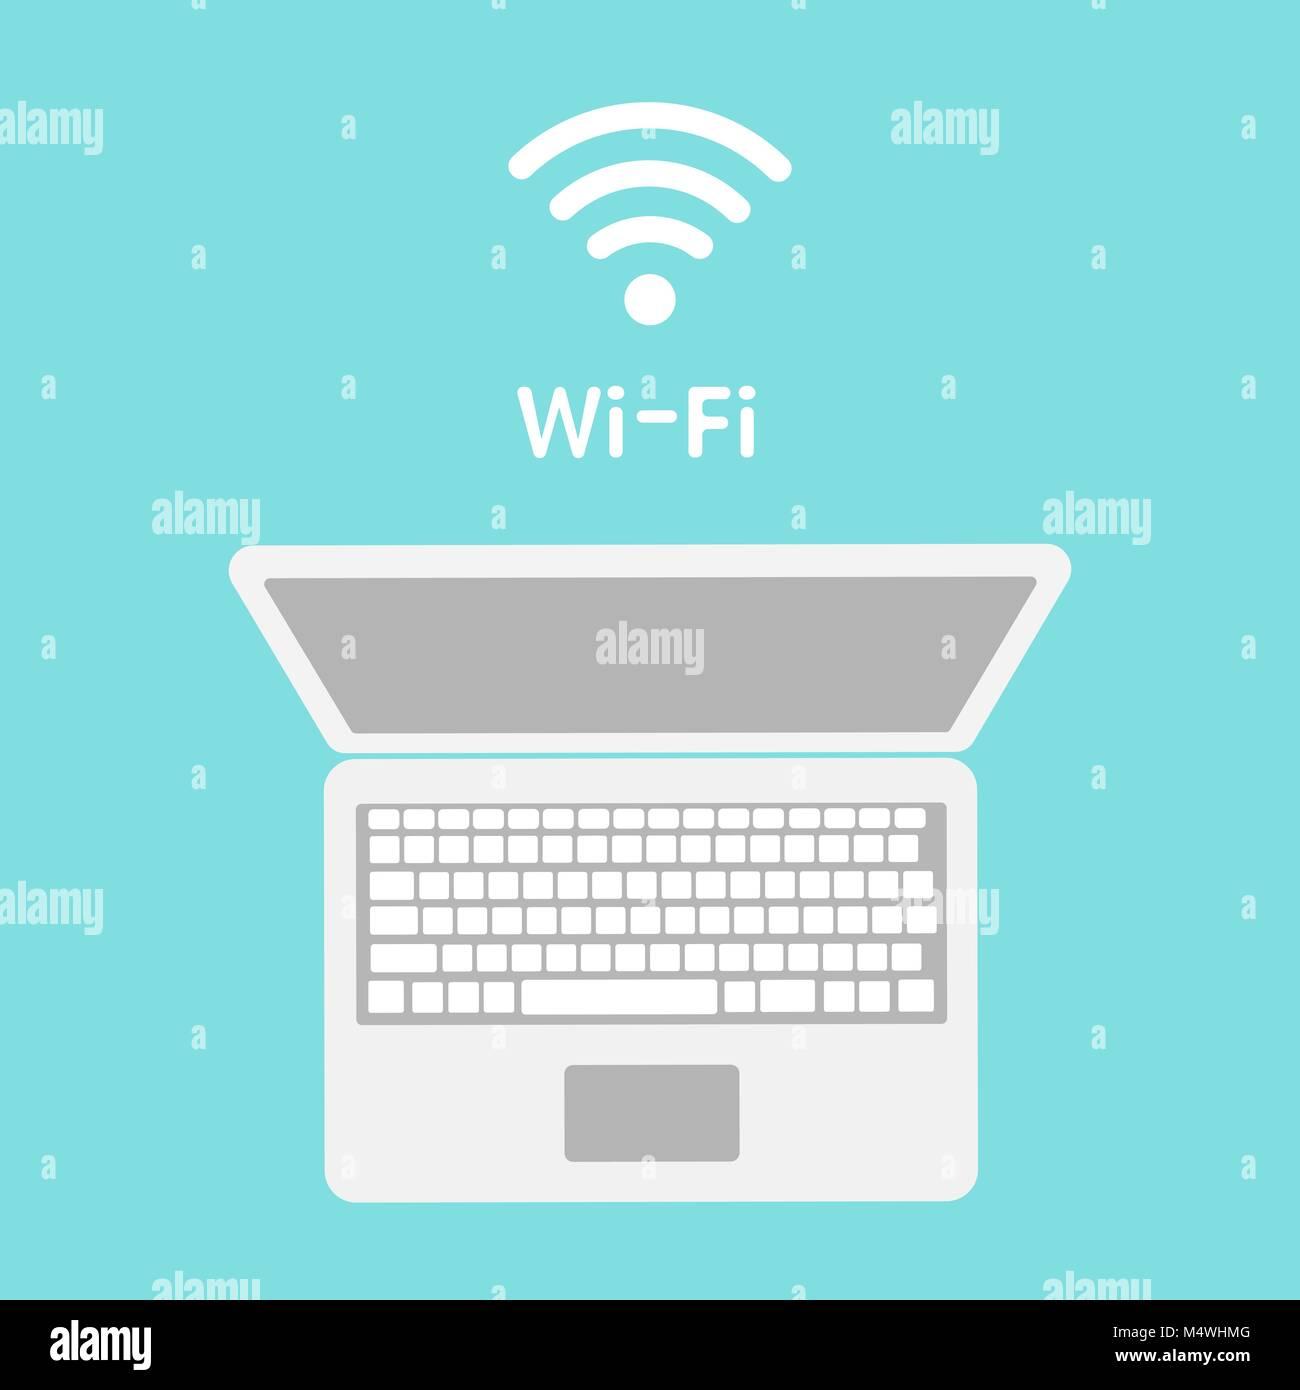 Wi-Fi icon on laptop screen  Wireless technology, wifi